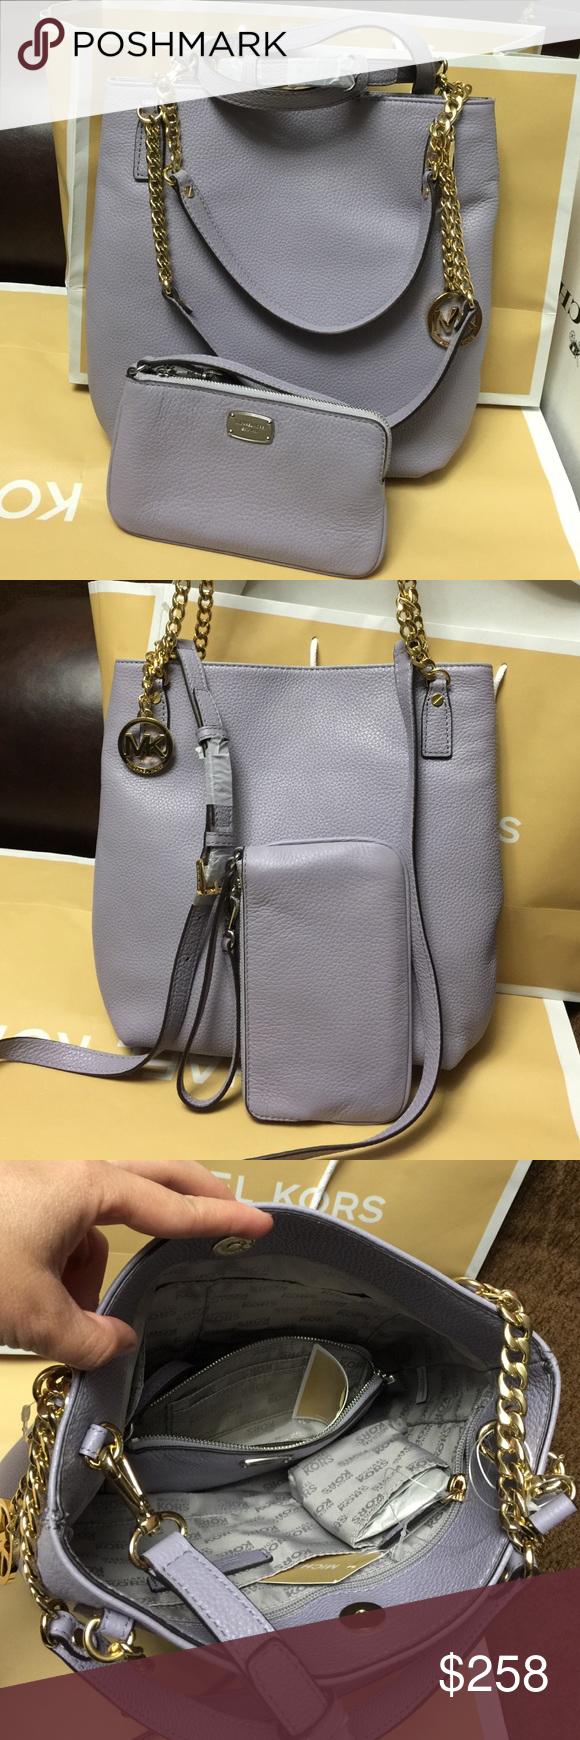 645f8b7bd0b8 Michael Kors Purse and Wristlet. Authentic Michael Kors Jet Set Chain  Items. MD Messenger. Lilac color, very beautiful Set. Price for both Michael  Kors Bags ...